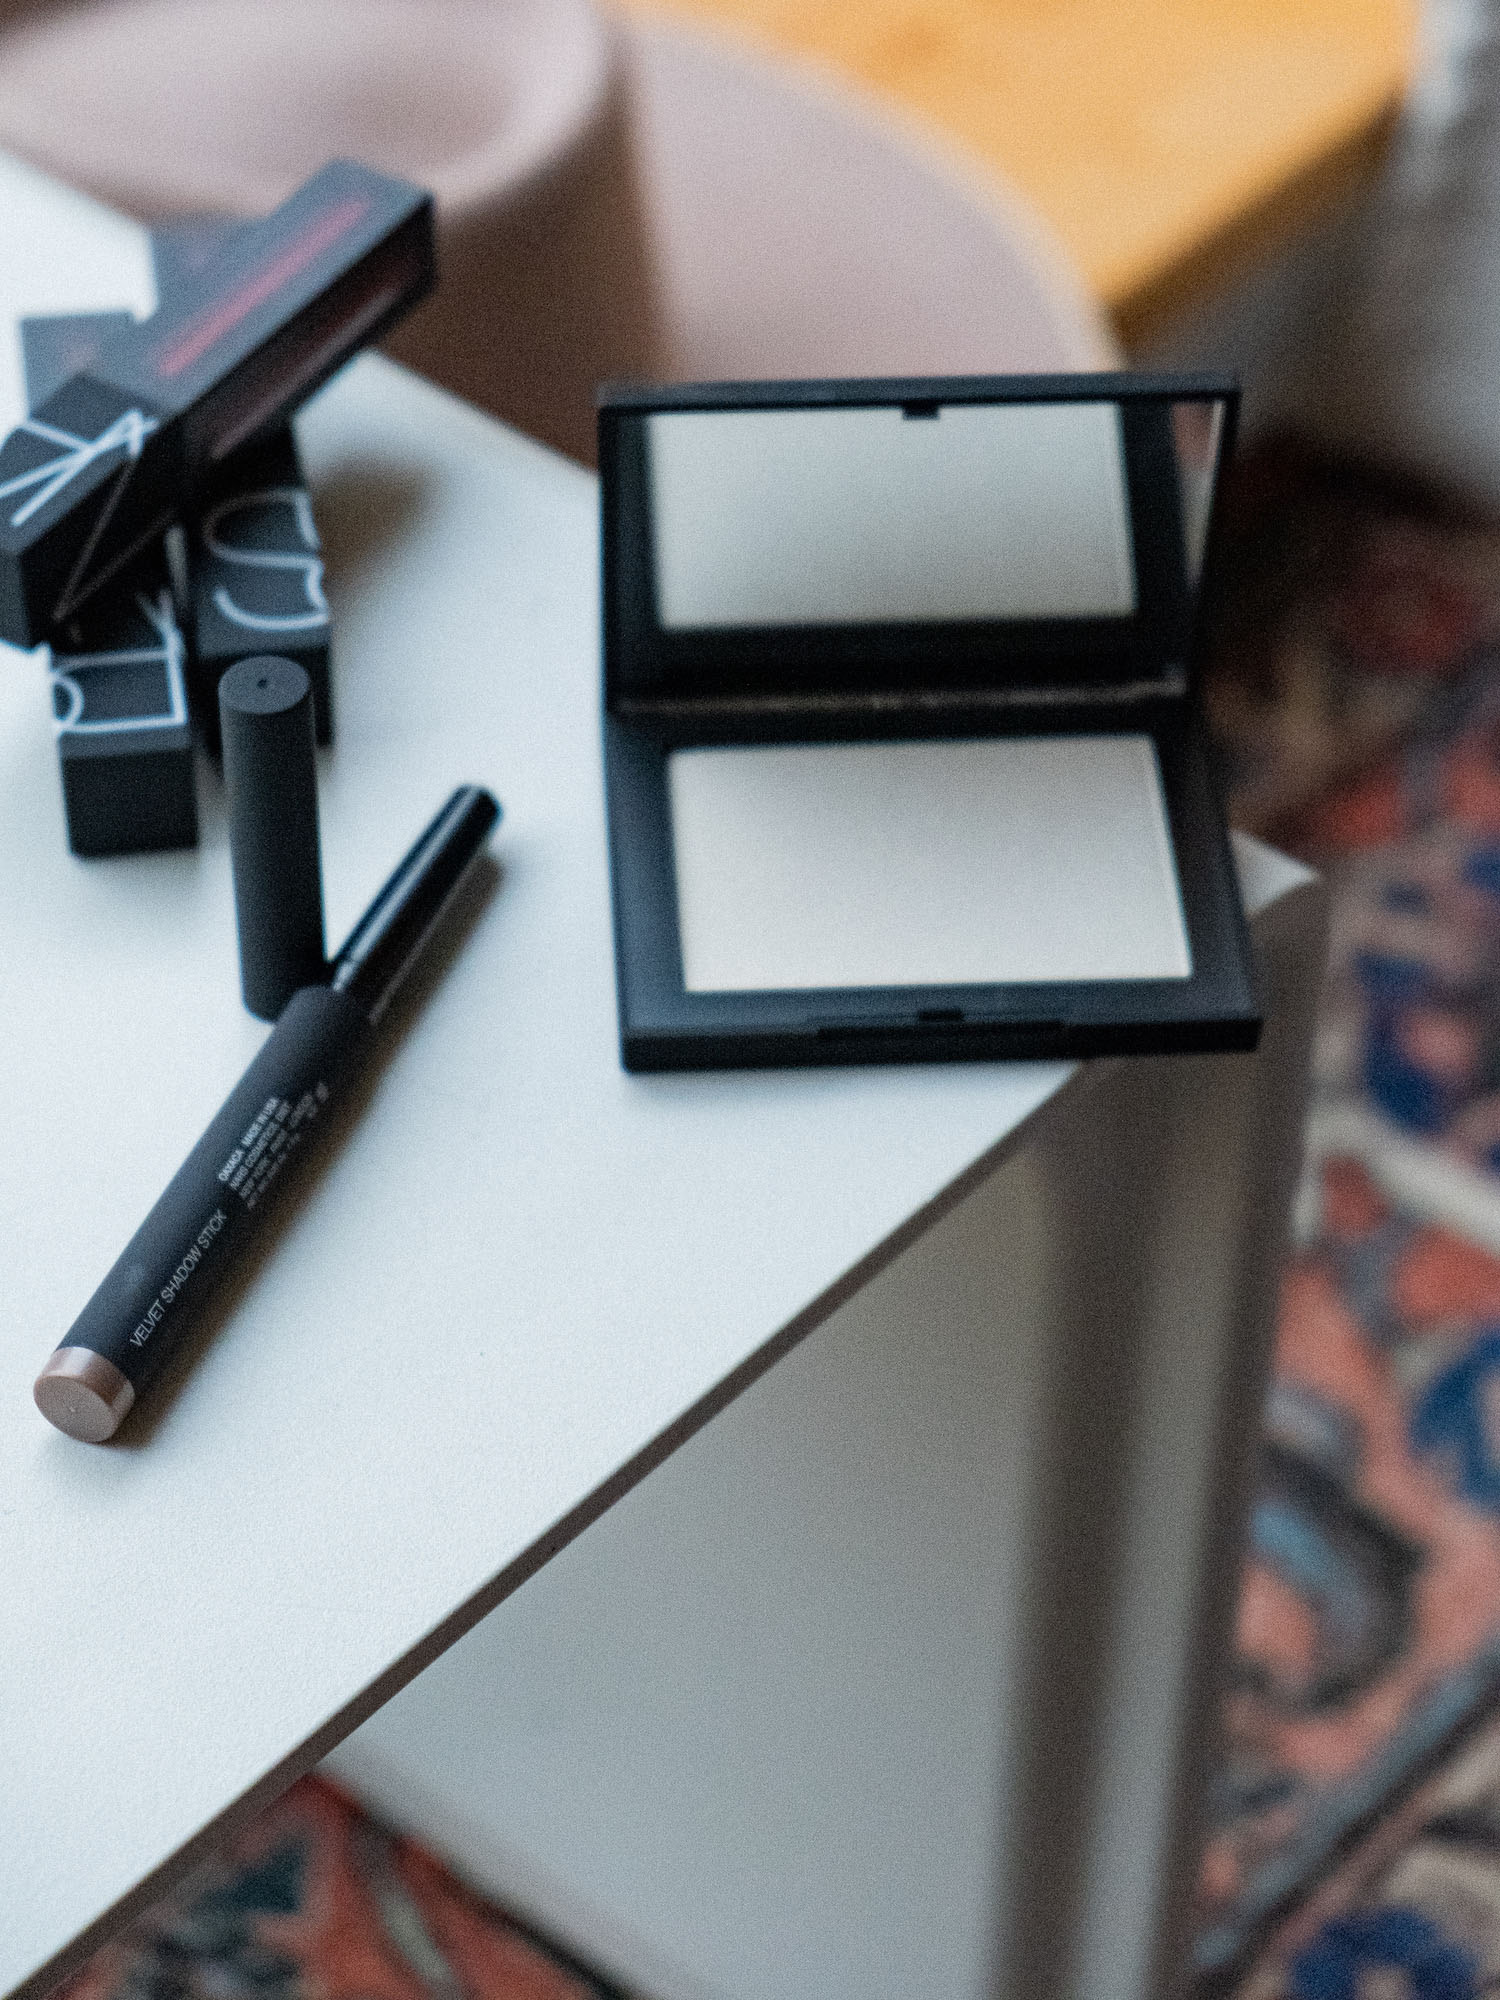 Bare Minds Beauty Adventskalender NARS Albatross Highlighting Powder 1